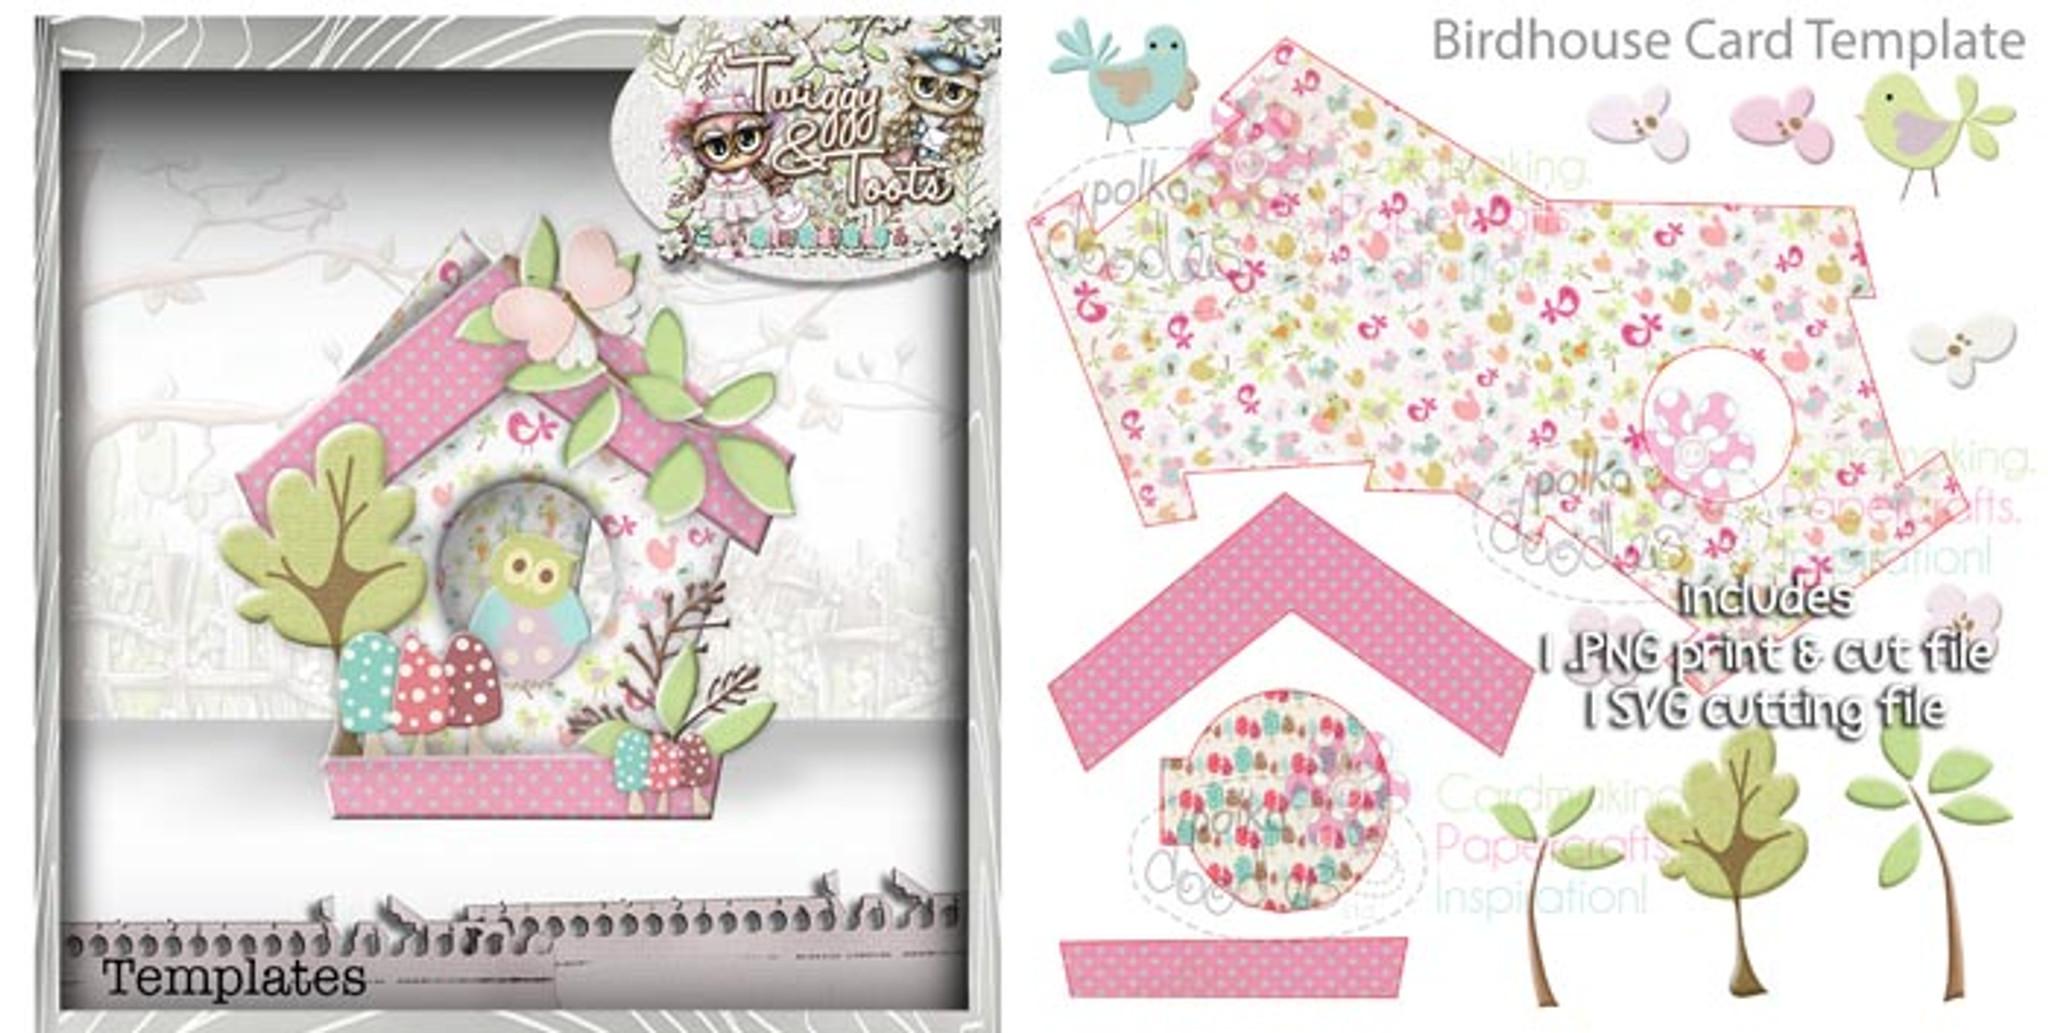 Birdhouse 2 Card Template SVG Cutting File